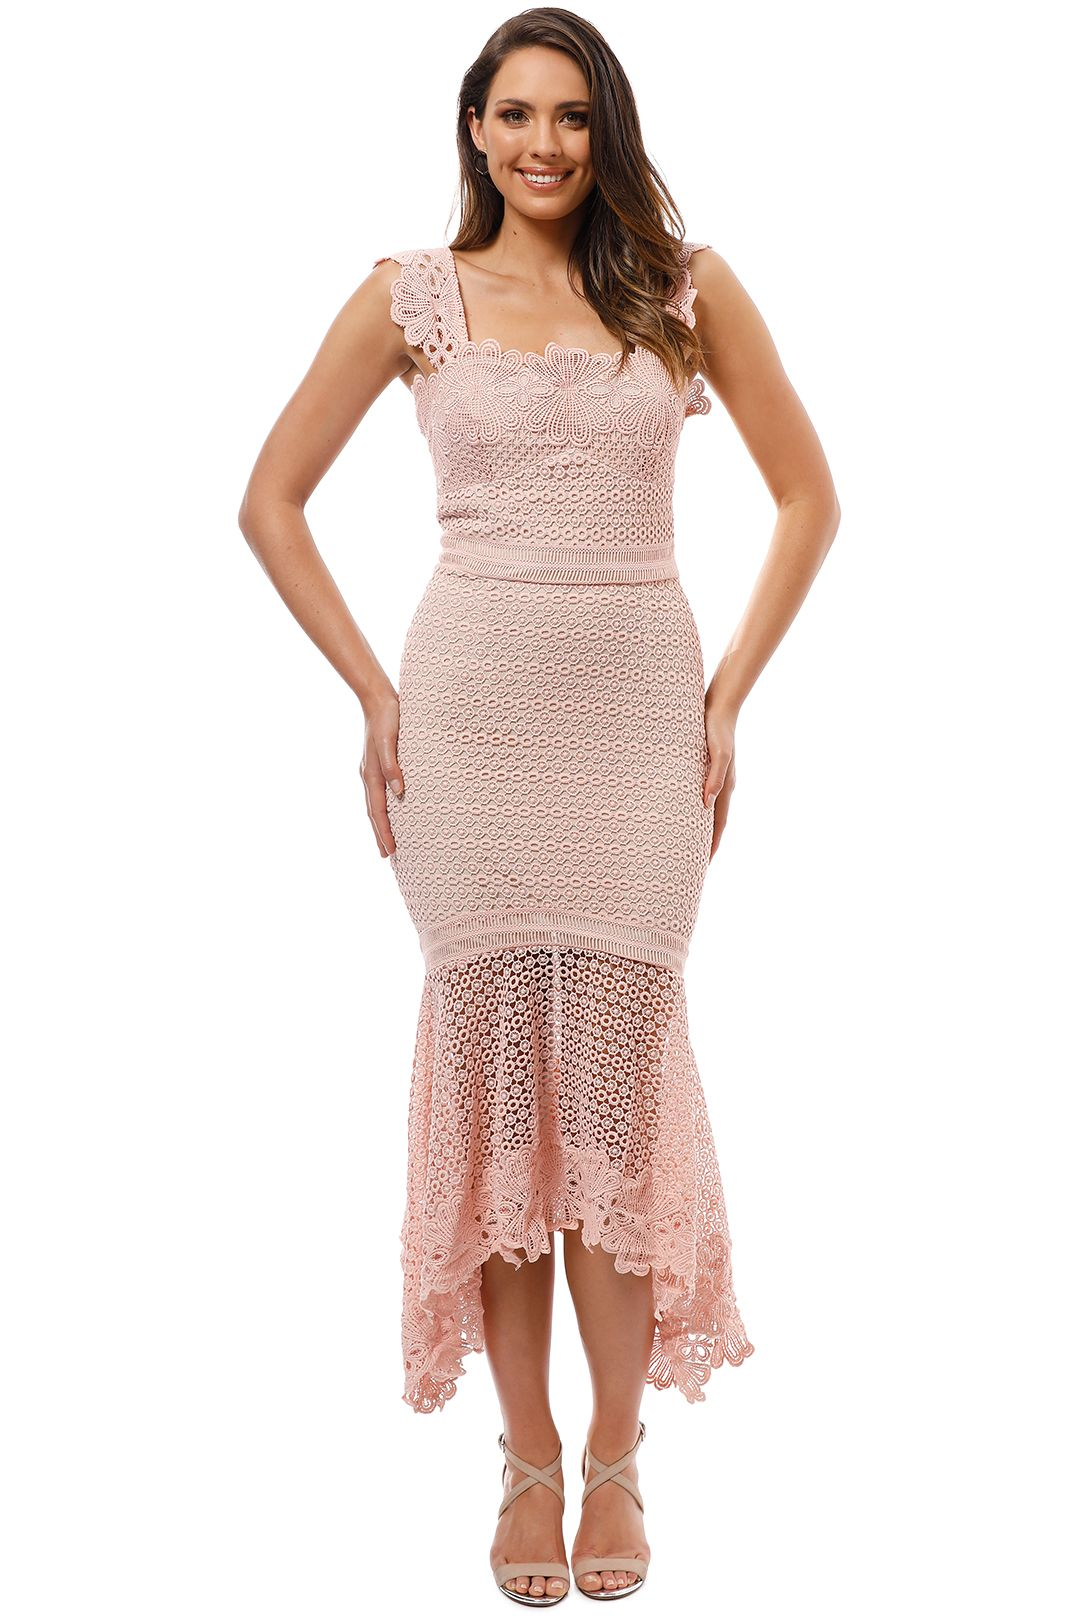 Grace and Hart - Paradiso Midi Dress - Rose - Front